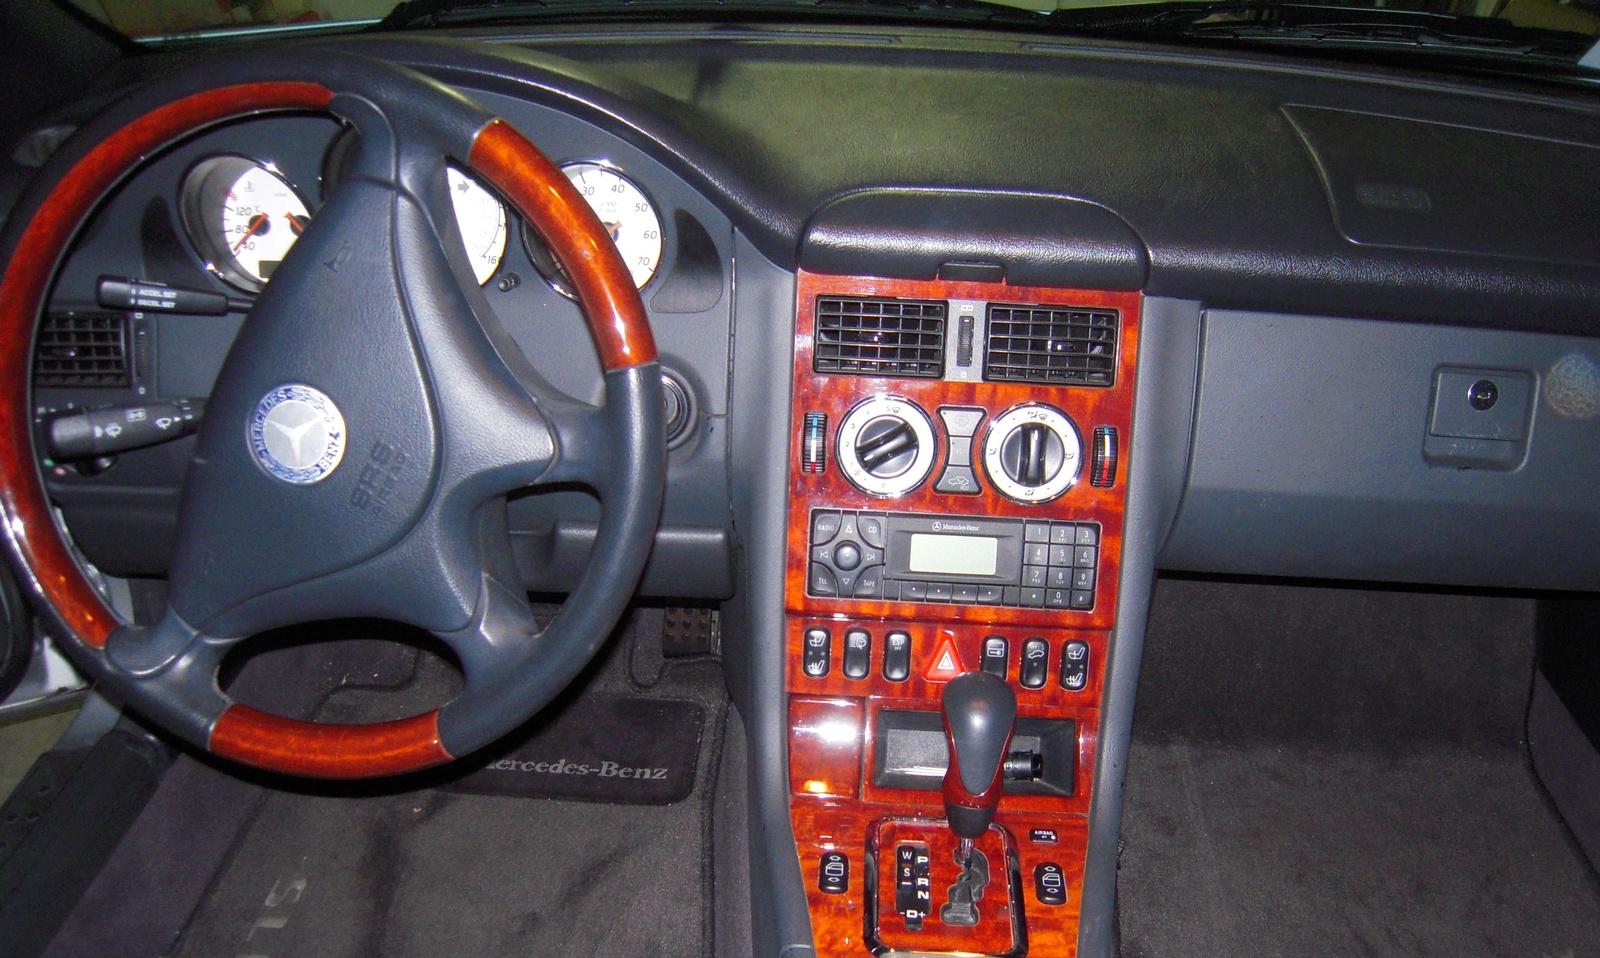 Mercedes-Benz SLK-Class #10